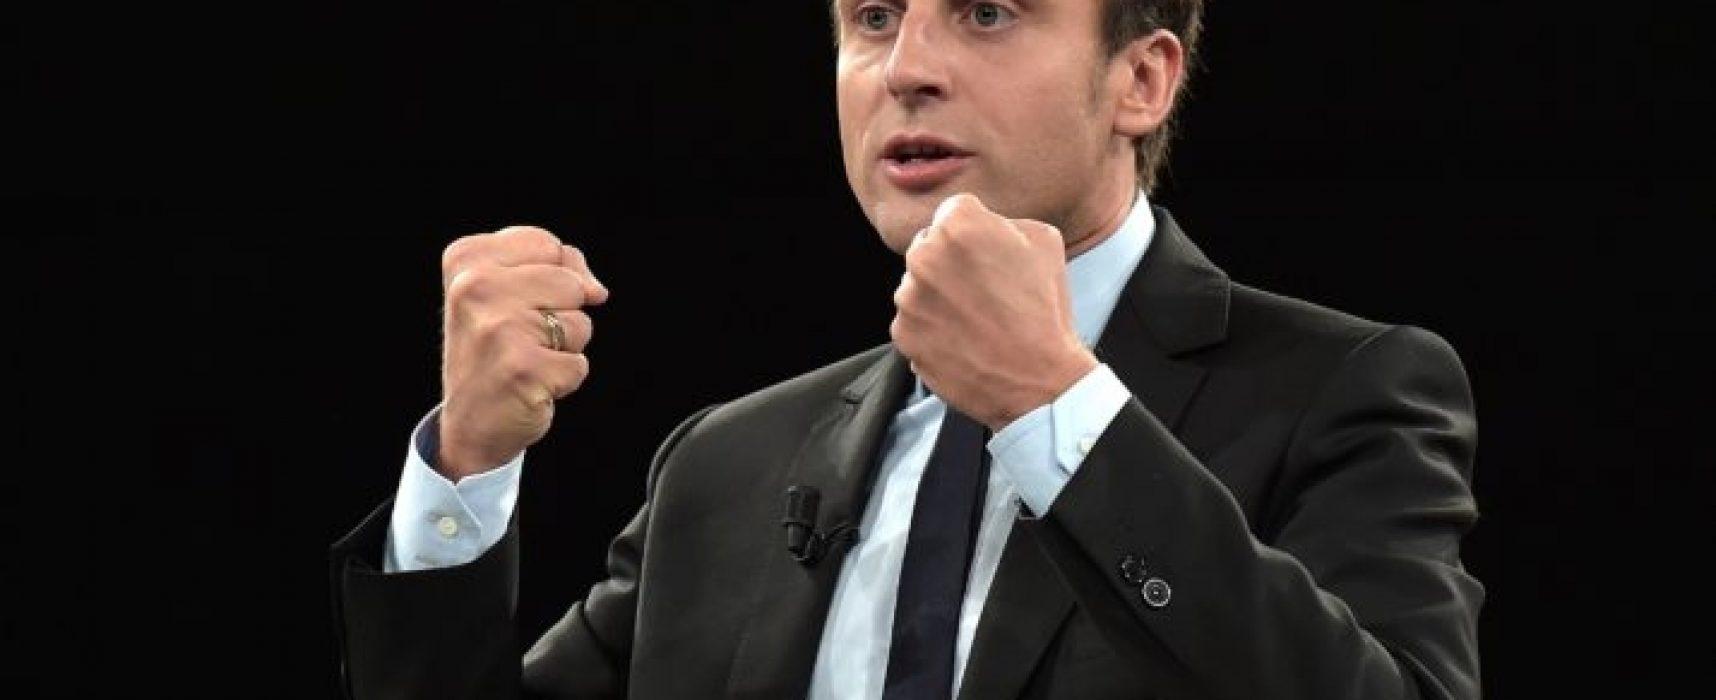 Falso: Macron ayudó a Kyiv llevar a cabo el Maidán